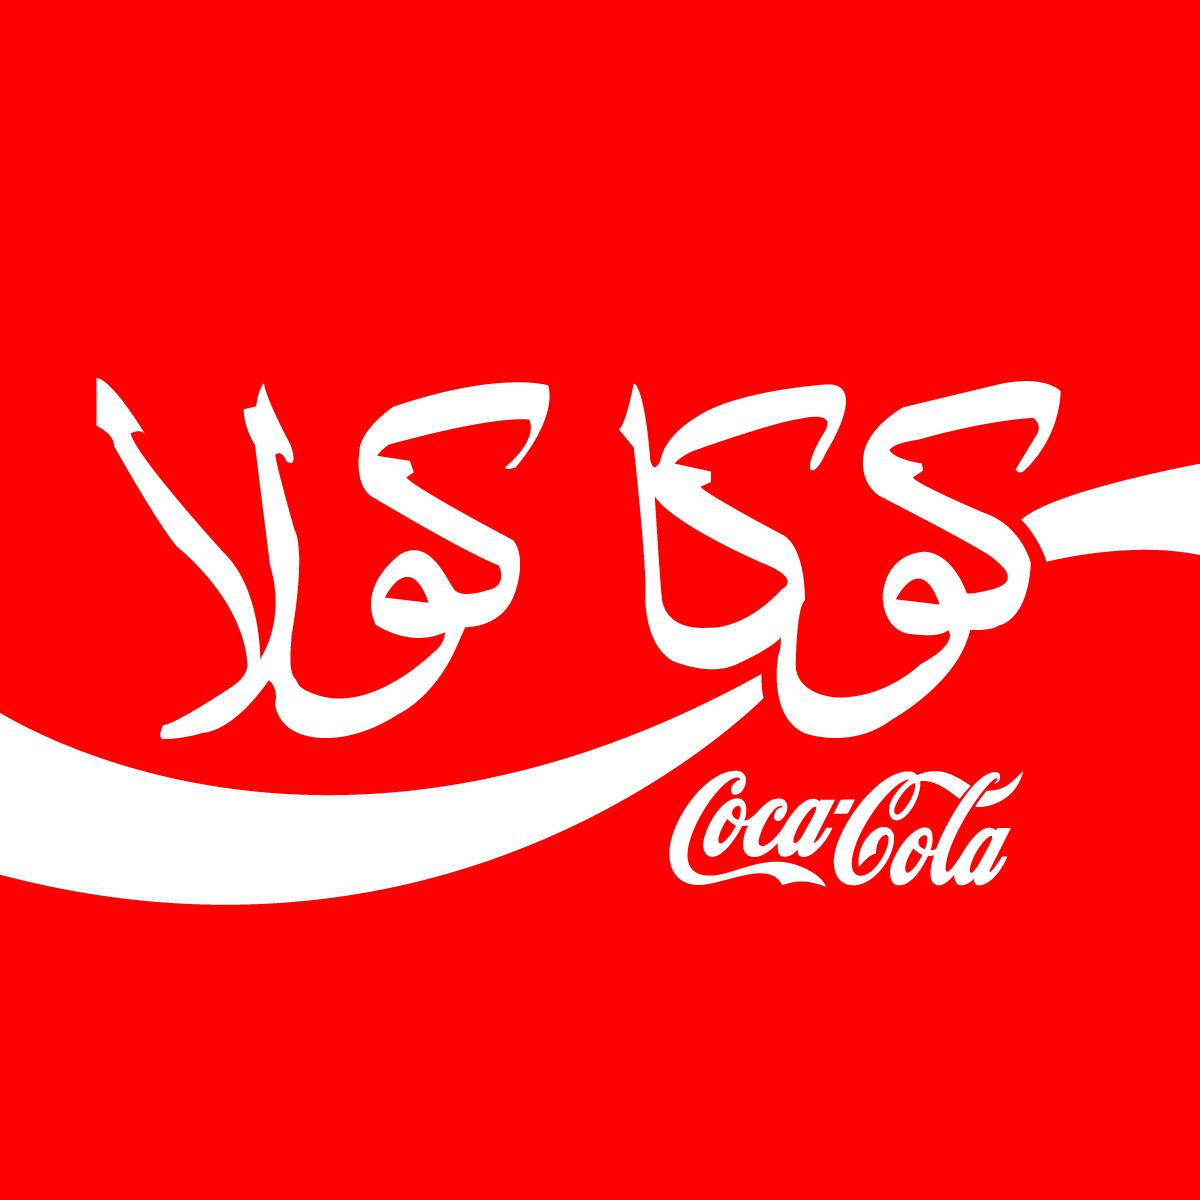 Logo Coca-Cola - Egypte